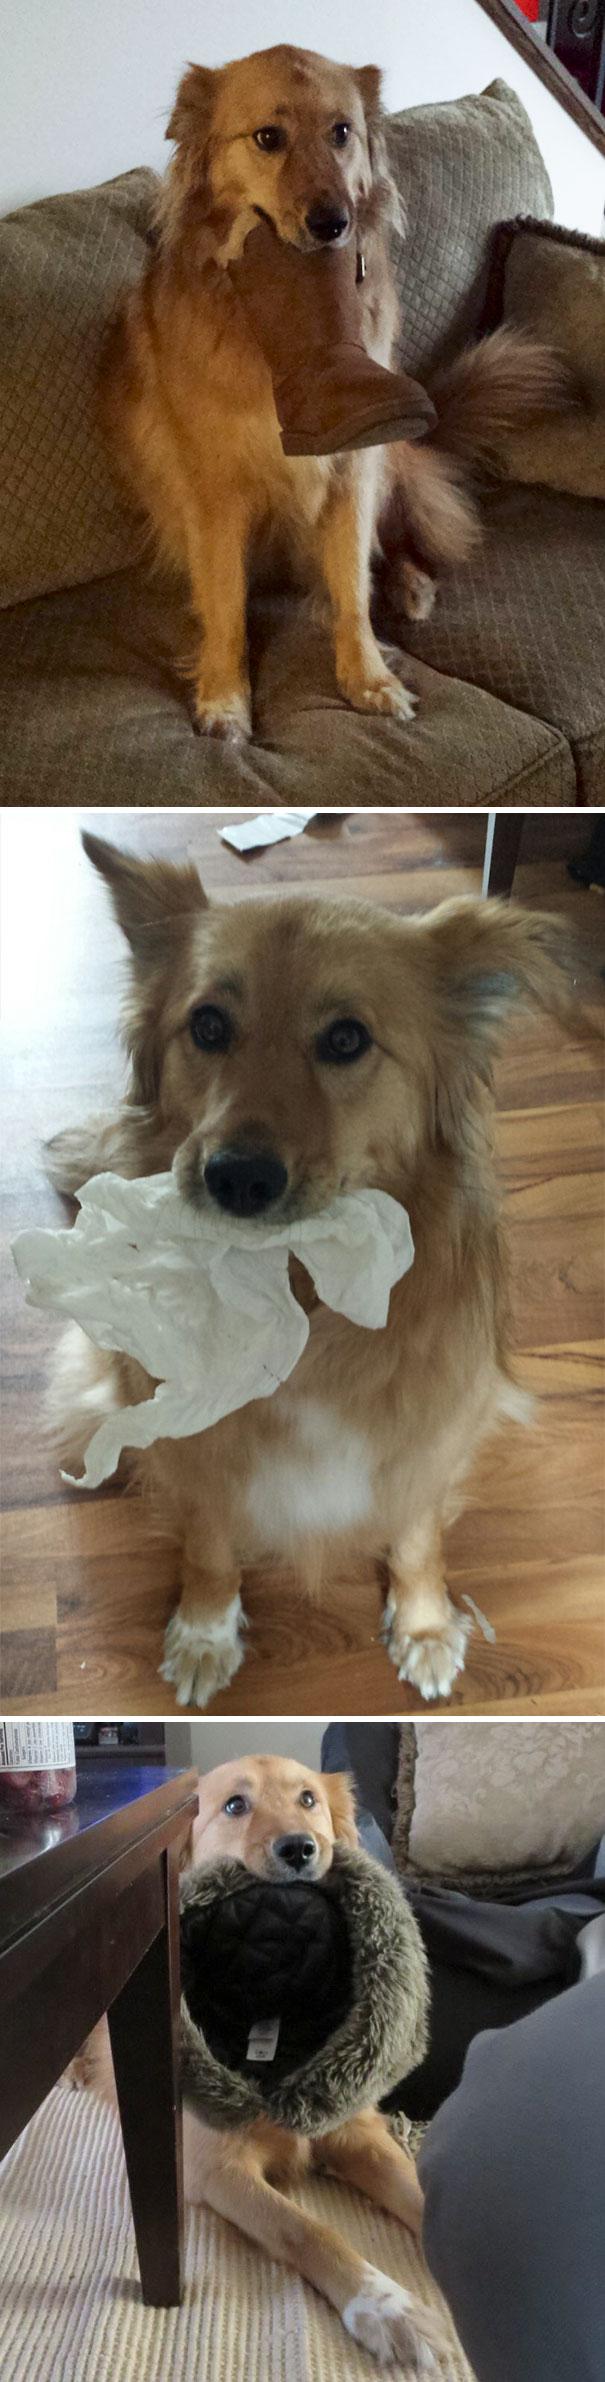 dog brought random things